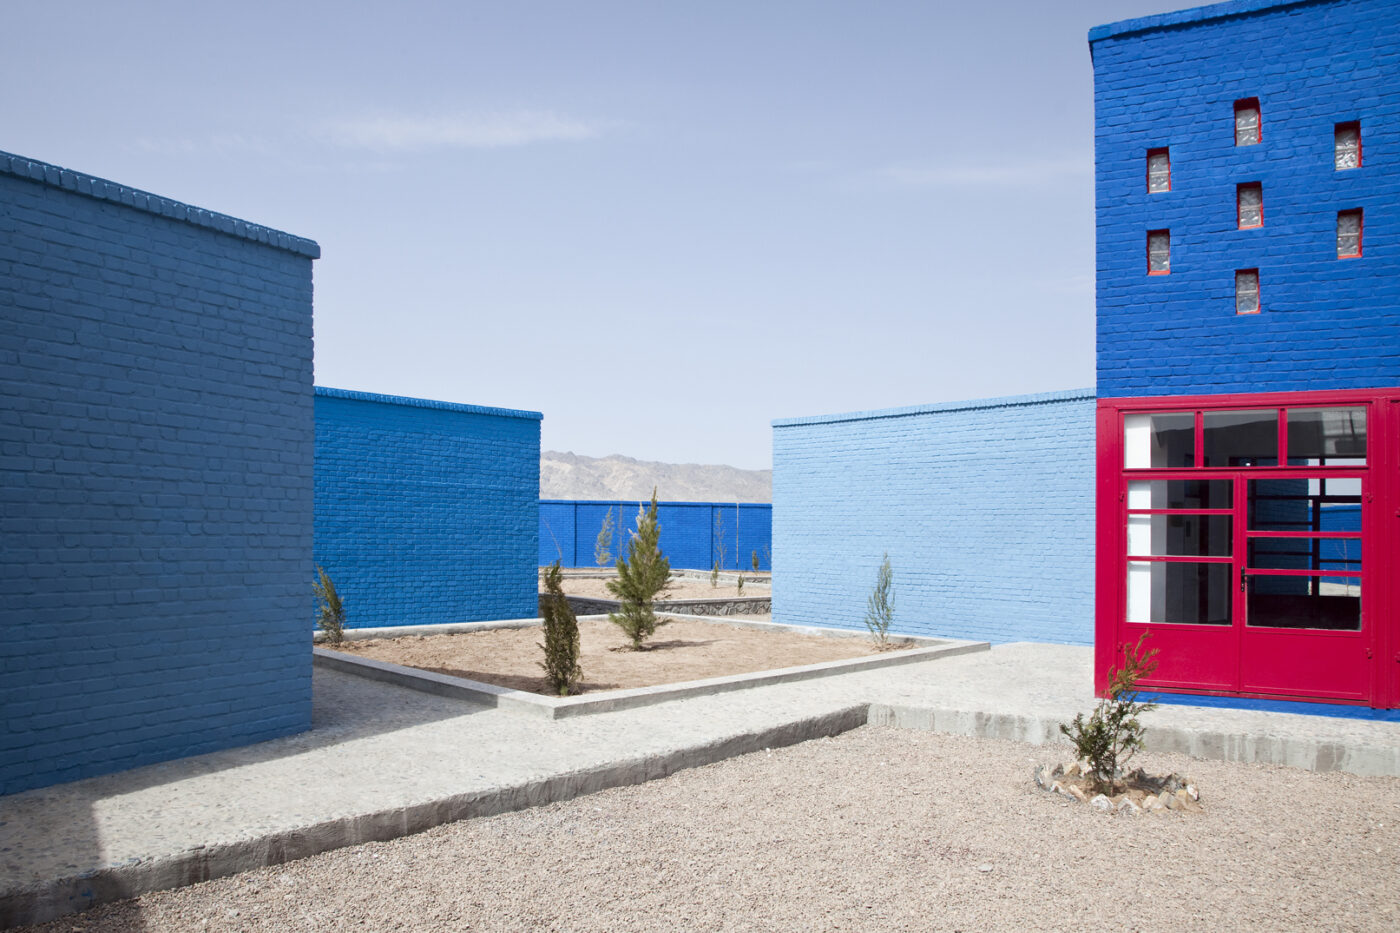 AFGHANISTAN: Maria Grazia Cutuli Primary School, Herat